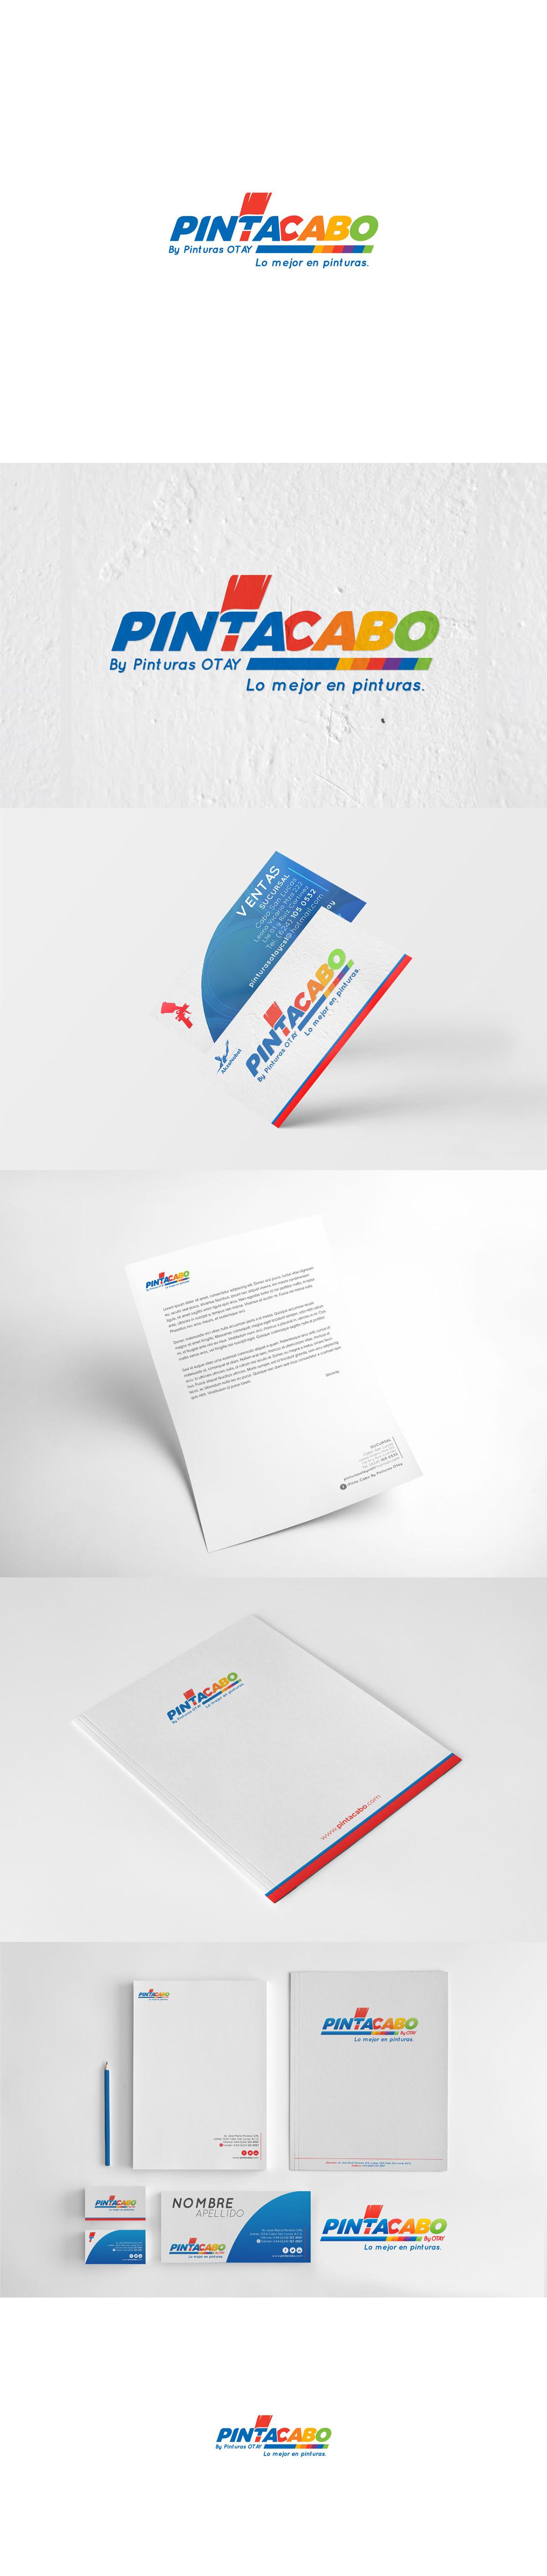 brand branding  Isologo isotipo logo Logotipo